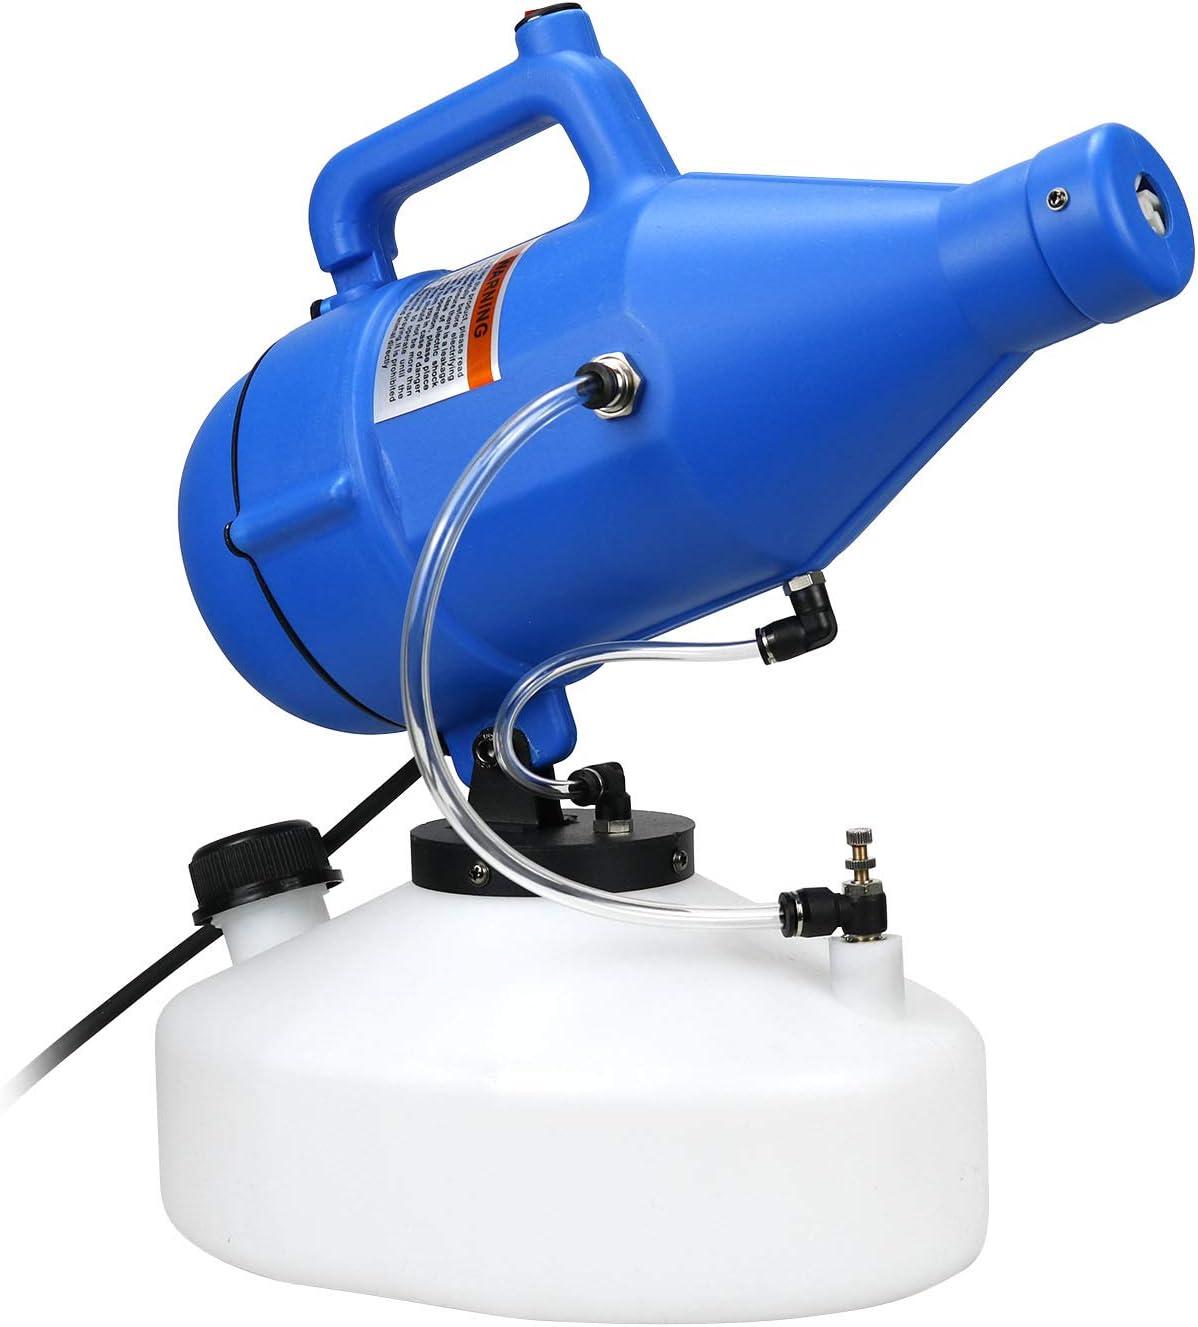 AILIKIWE Electric ULV Fogger Sprayer Machine,4.5L(1.2 Gallon) Handheld Atomizer Machine Mist Cold Fogger Suitable for Home,Garden,Hotel,Office,School,Station